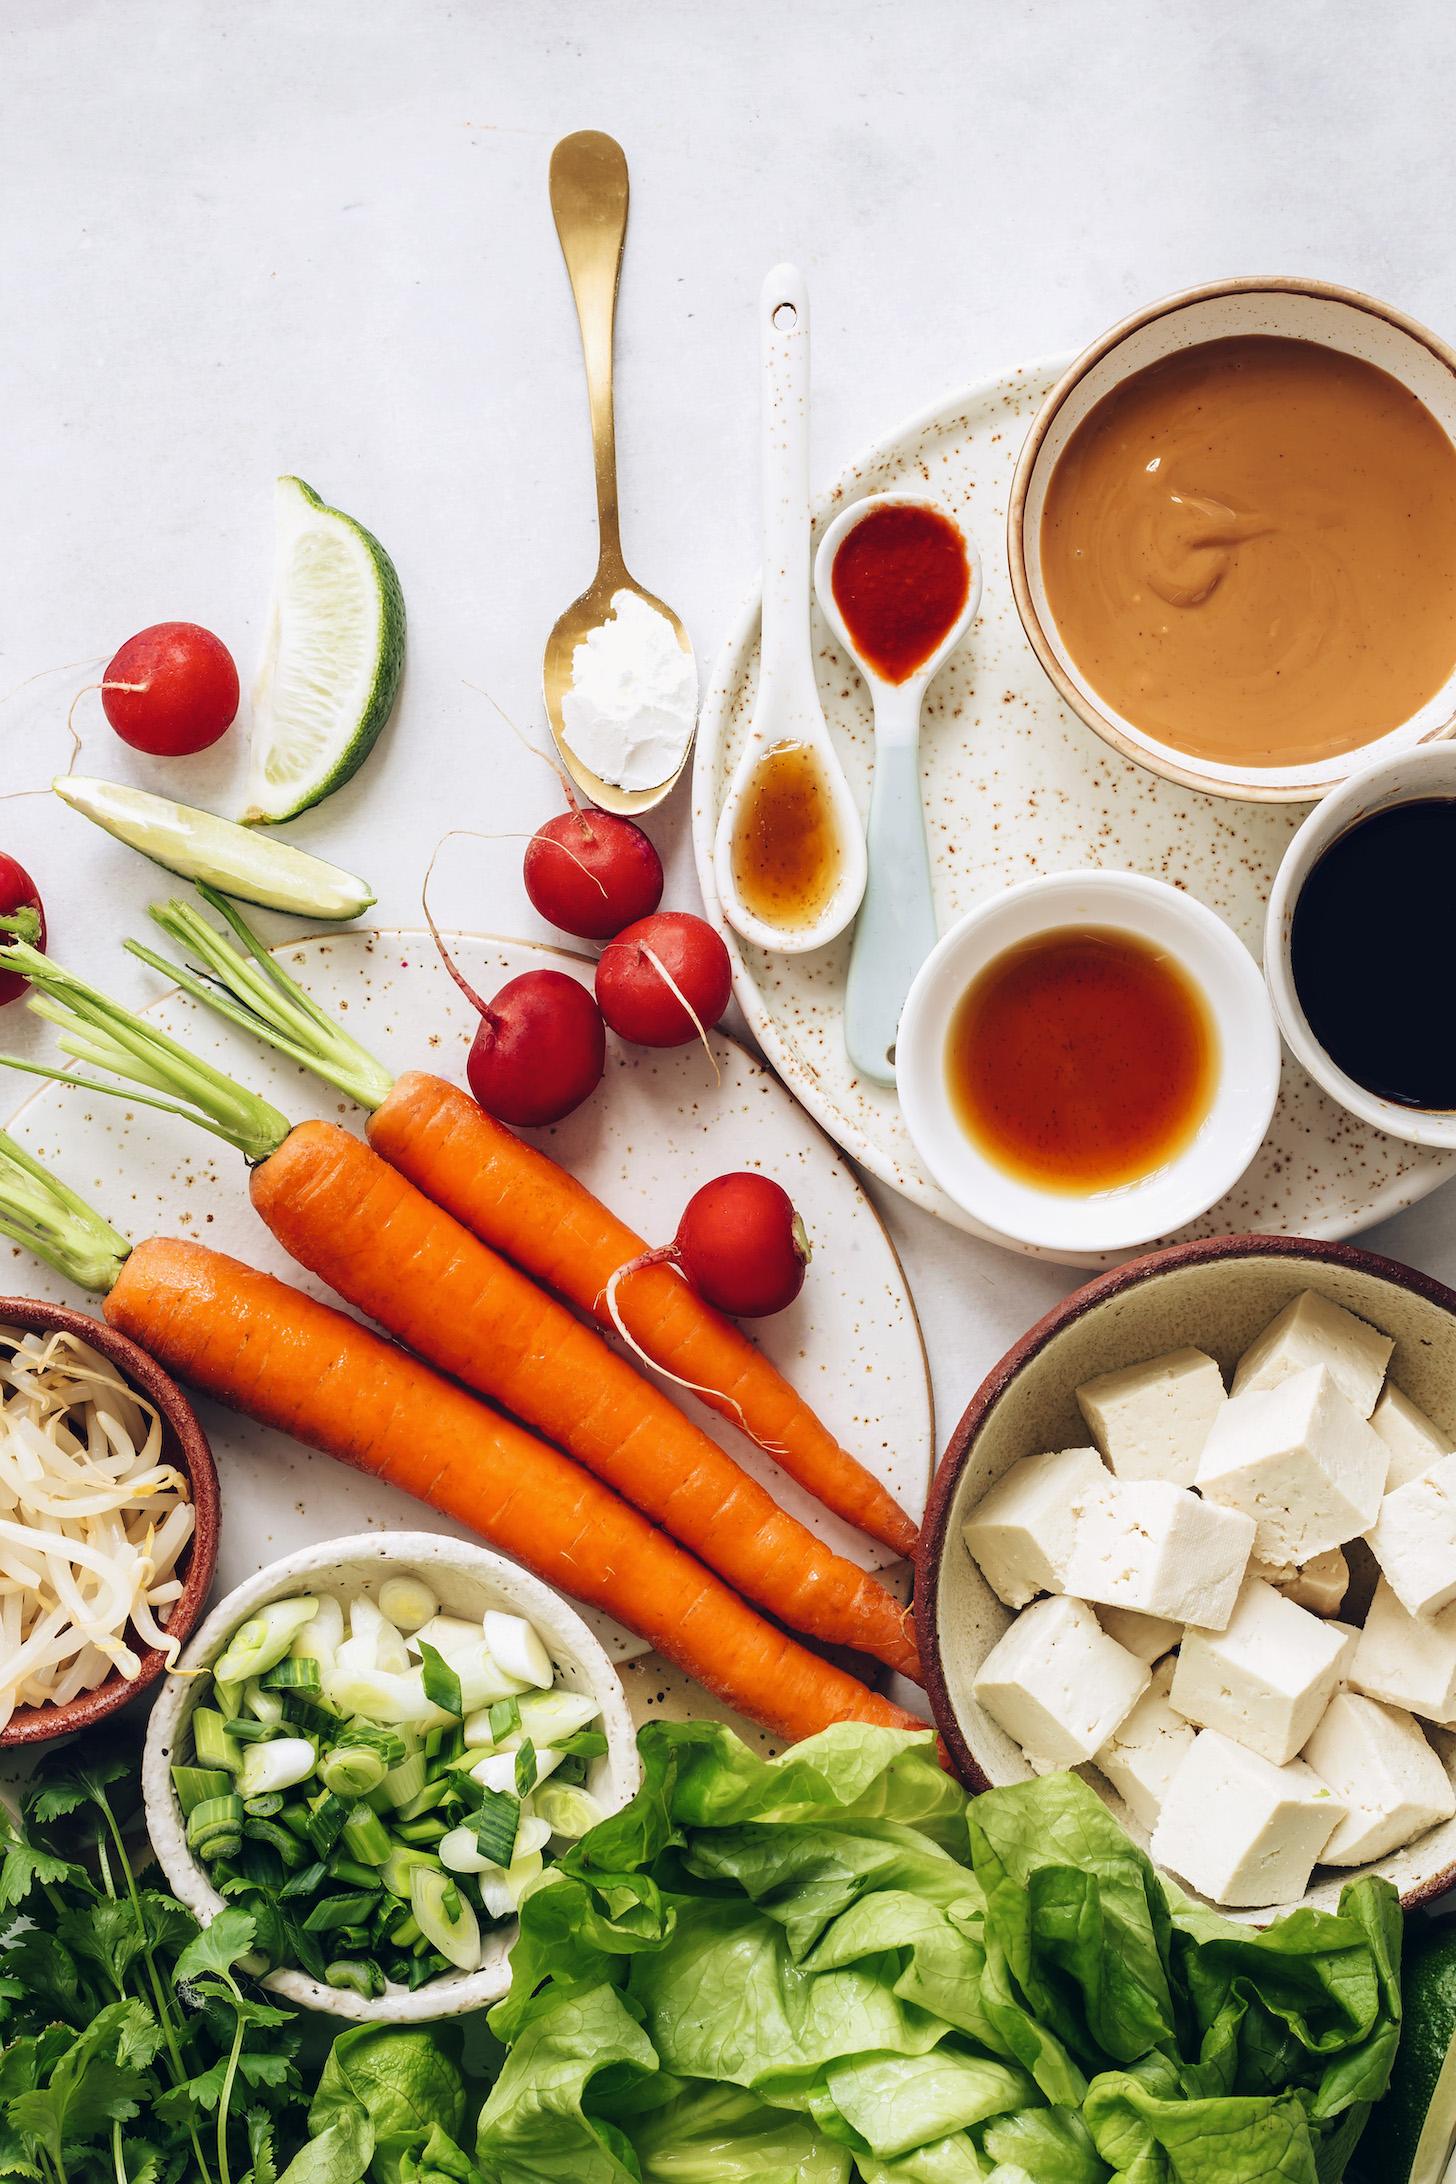 Carrots, radish, green onion, bean sprouts, lettuce, tofu, cornstarch, peanut butter, chili garlic sauce, maple syrup, toasted sesame oil, and tamari